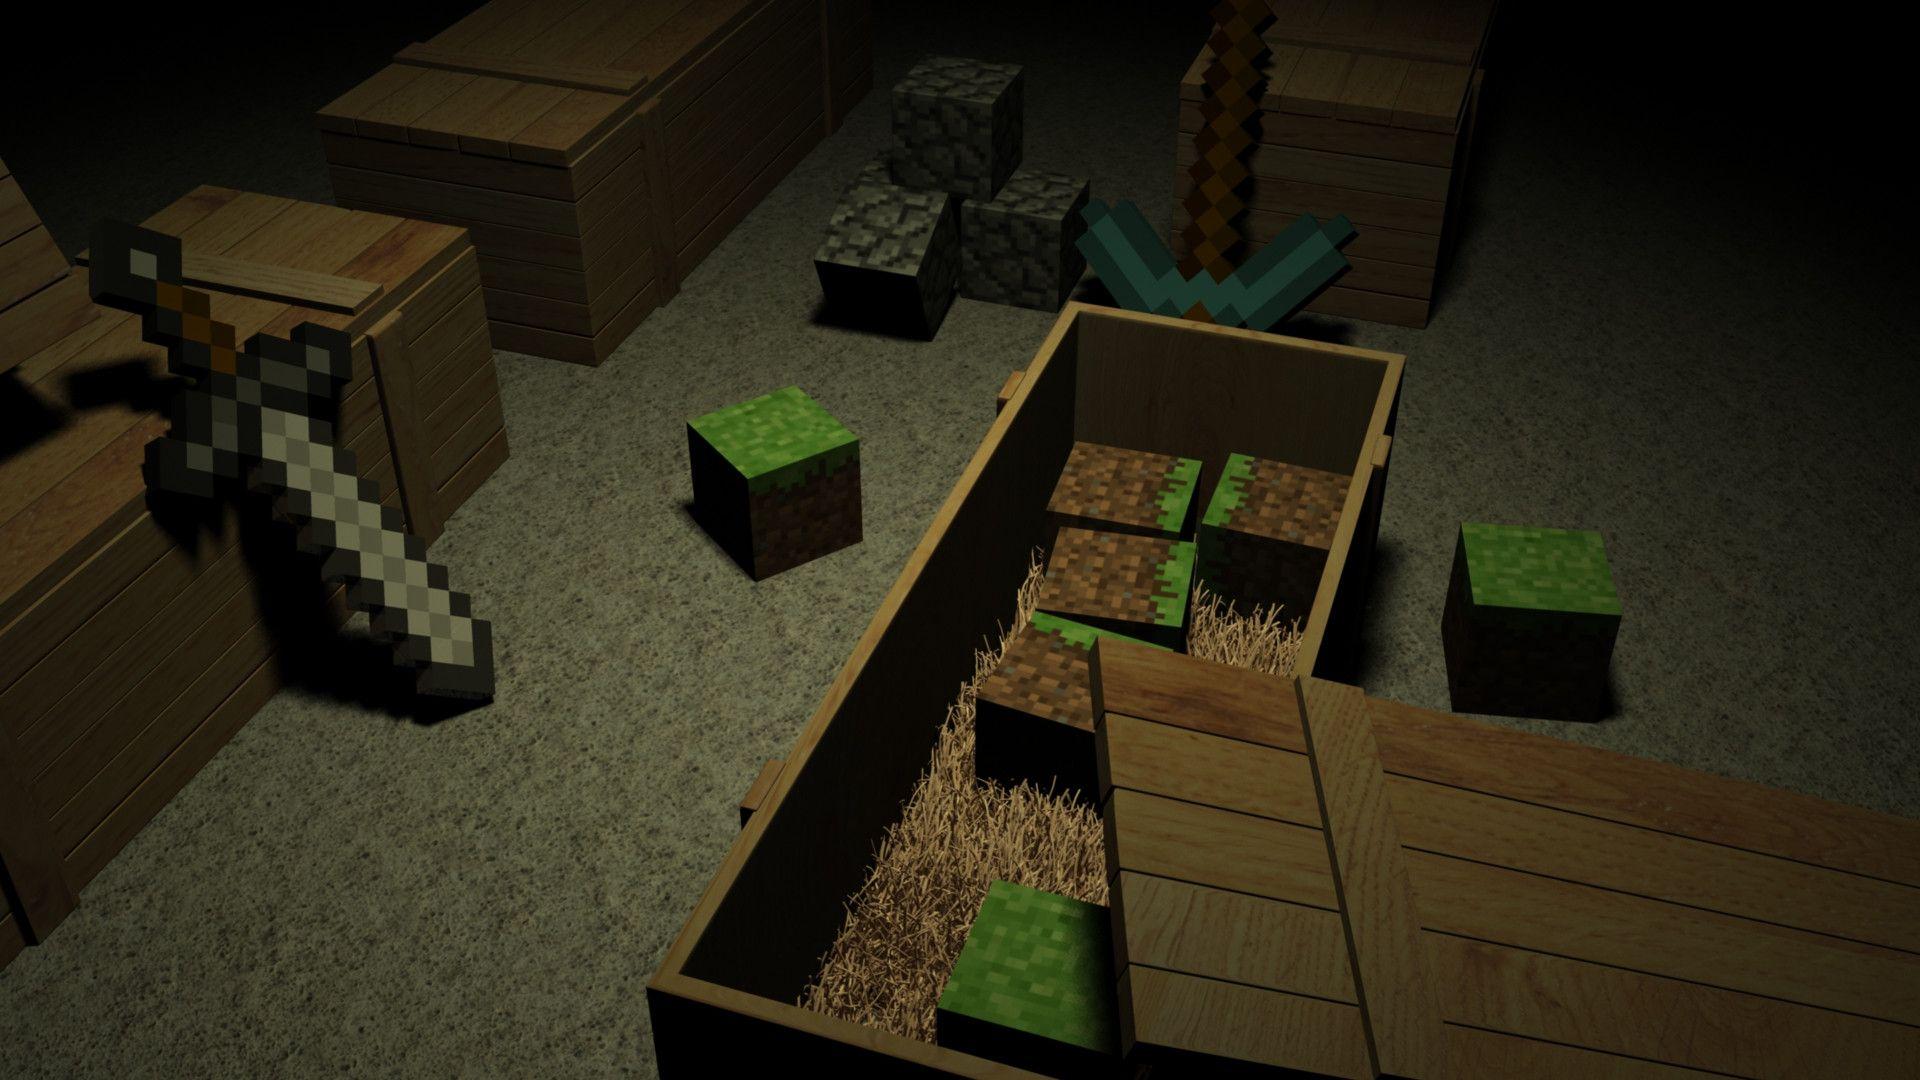 Cool Wallpaper Minecraft Google - 95ca4c07424d517212795a63664ef45d  Image_491371.jpg